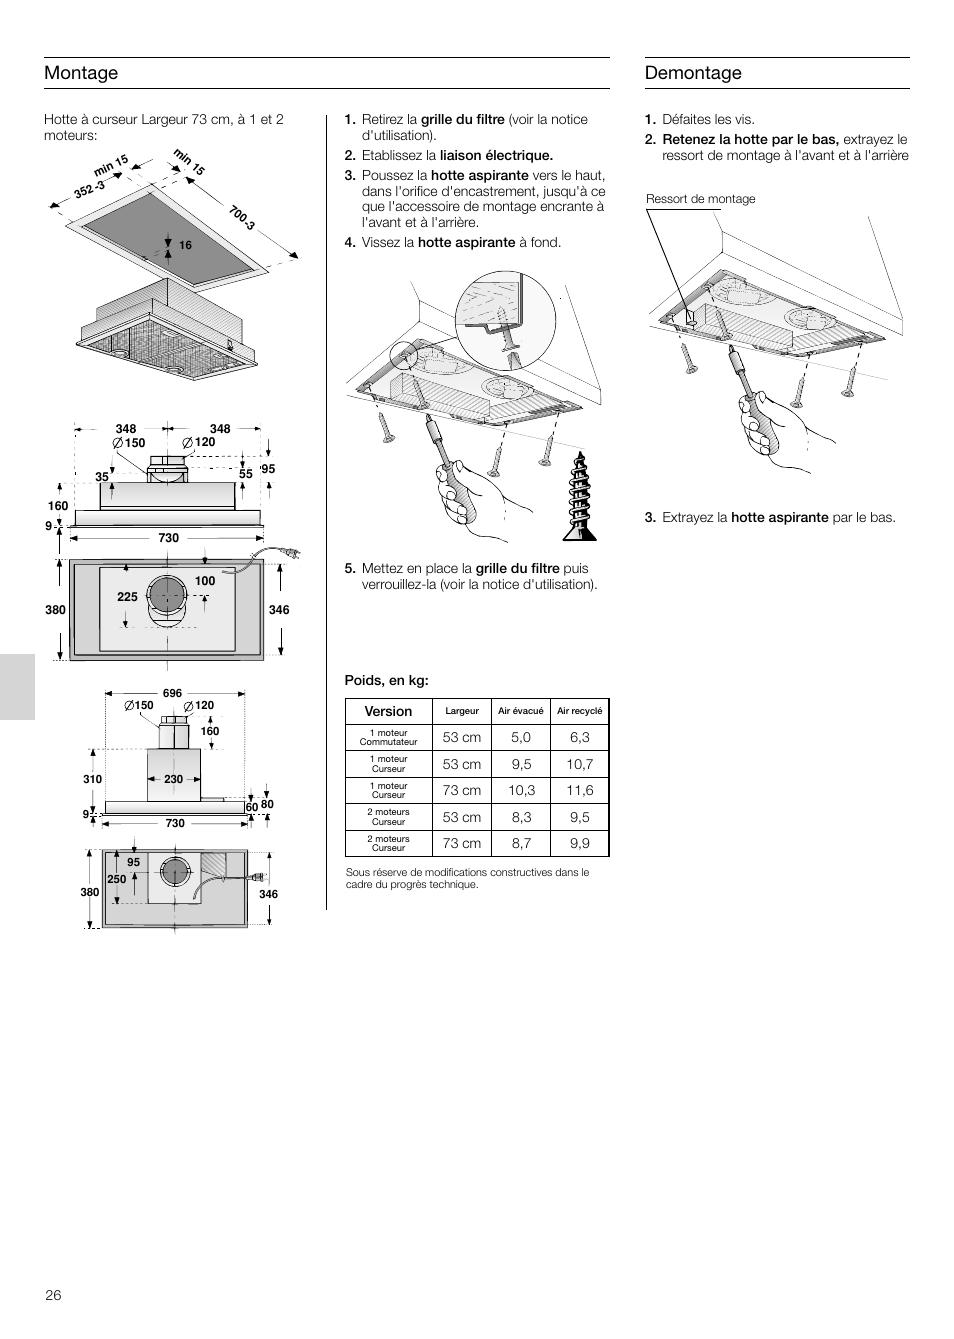 montage, demontage | siemens lb75564 user manual | page 26 / 64